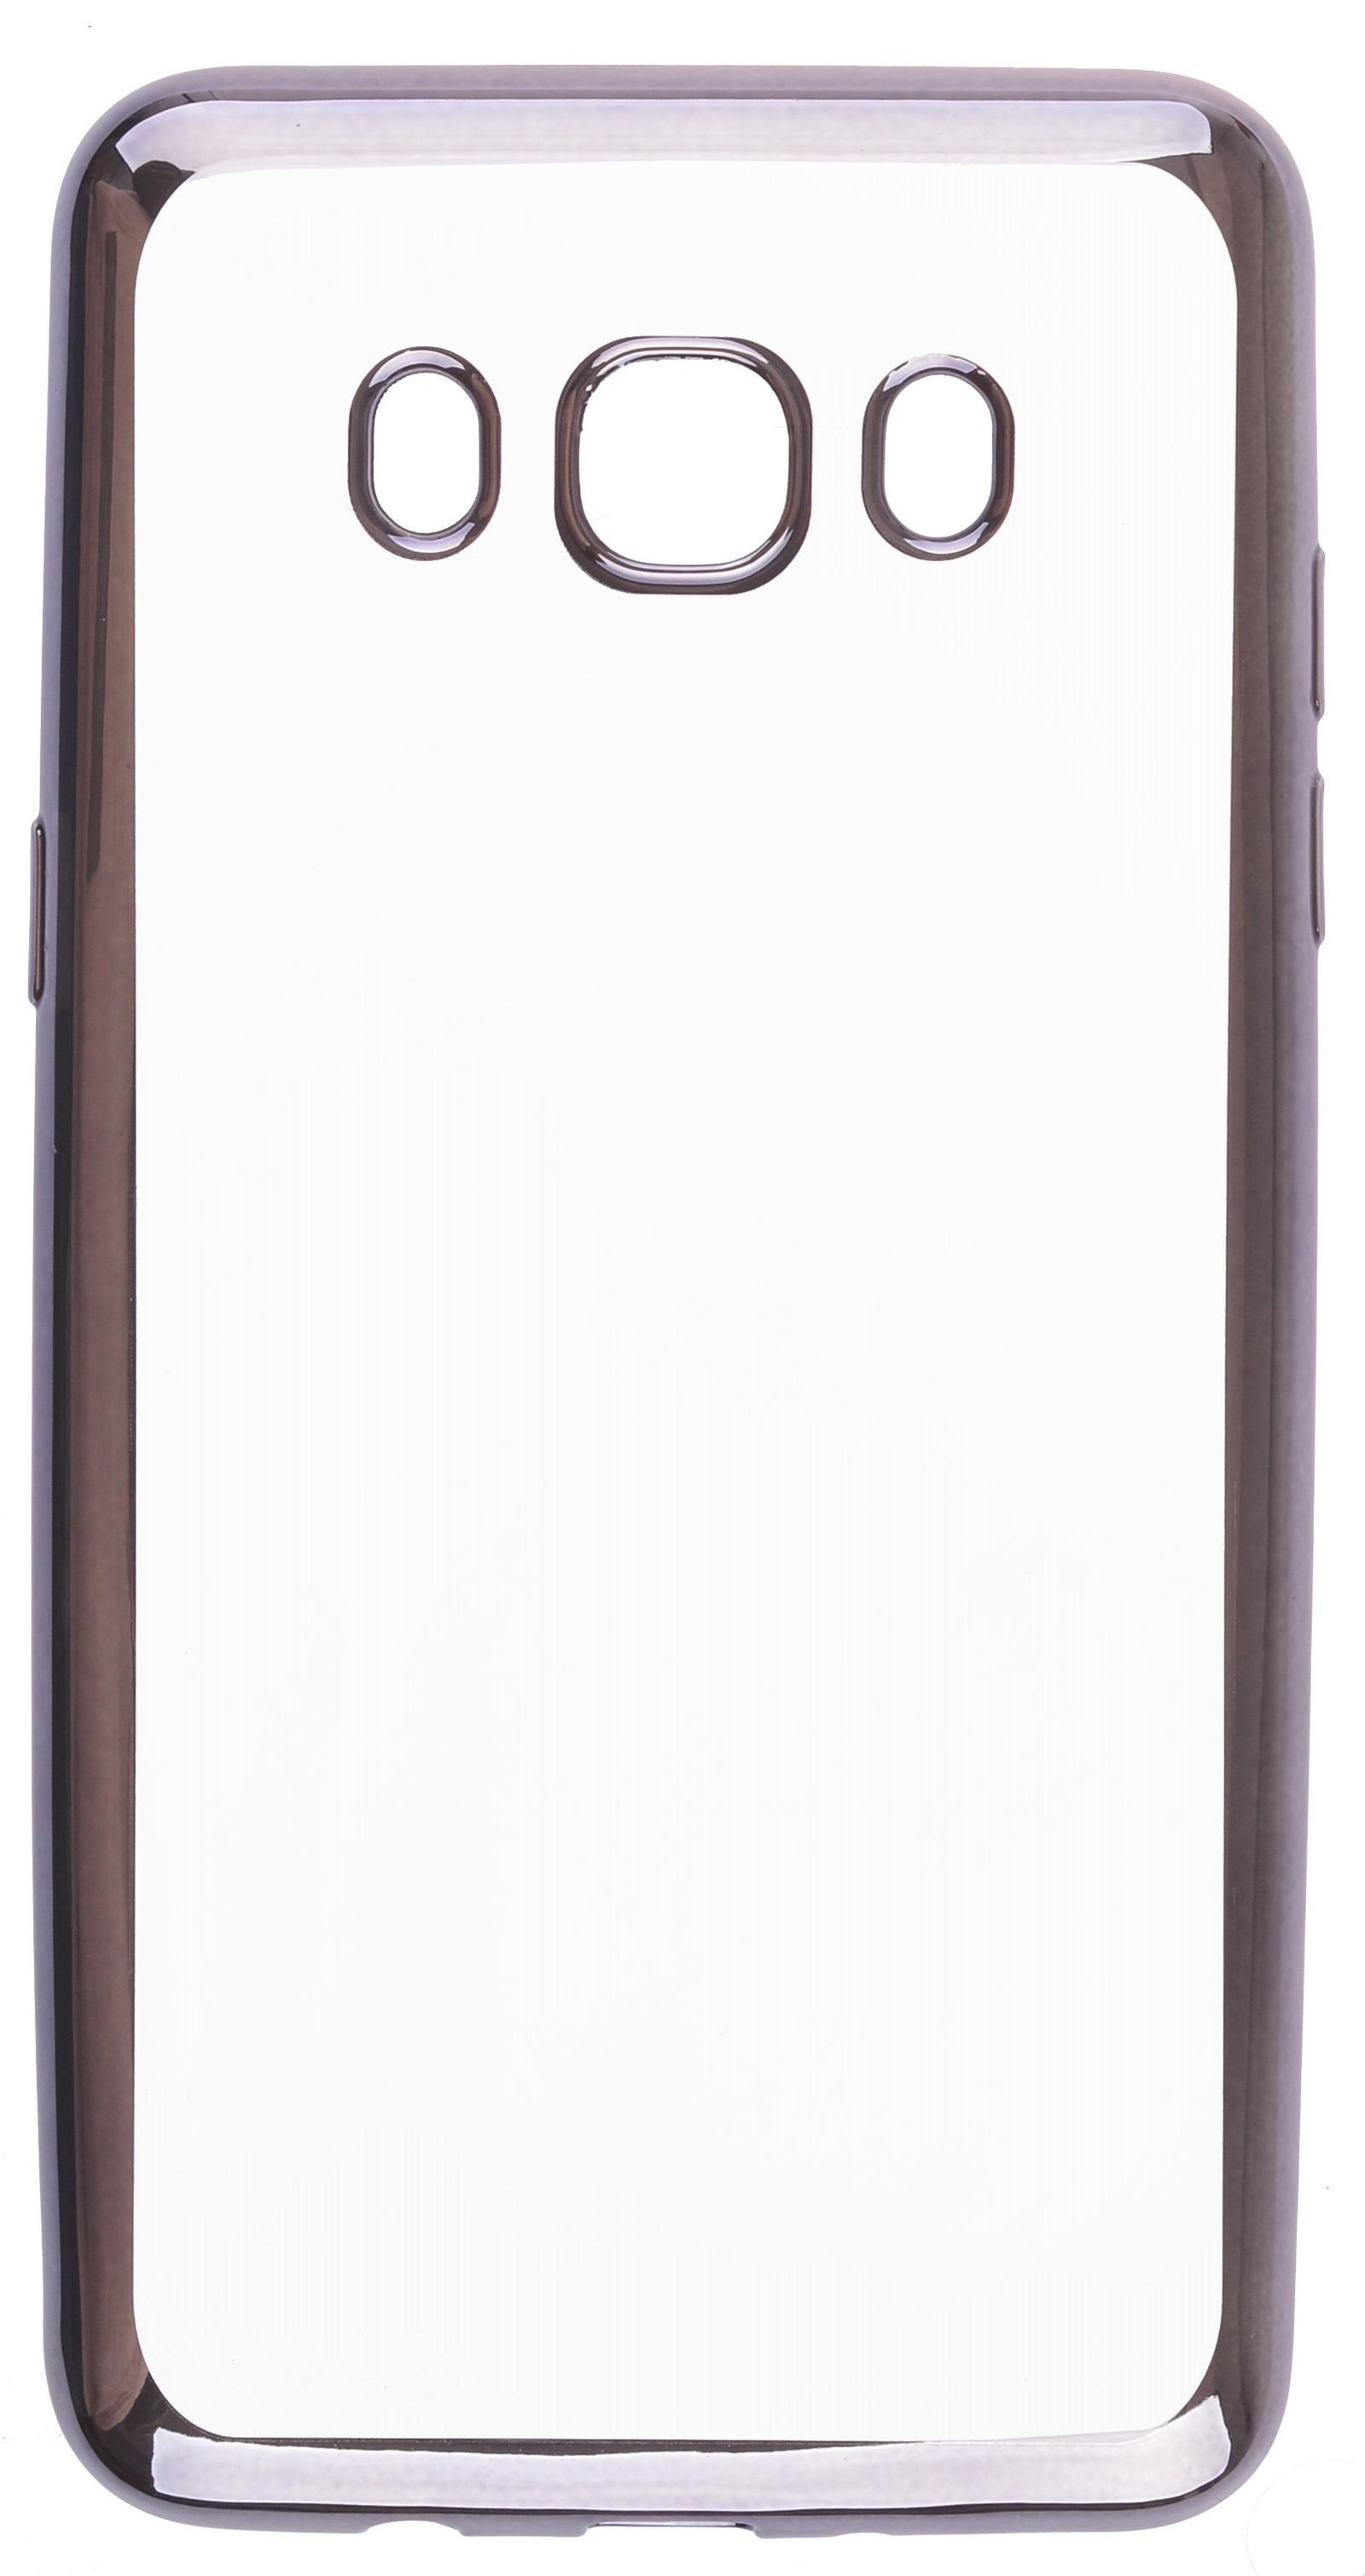 Чехол для сотового телефона skinBOX Silicone chrome border, 4630042528734 protective pu leather case for htc one s black